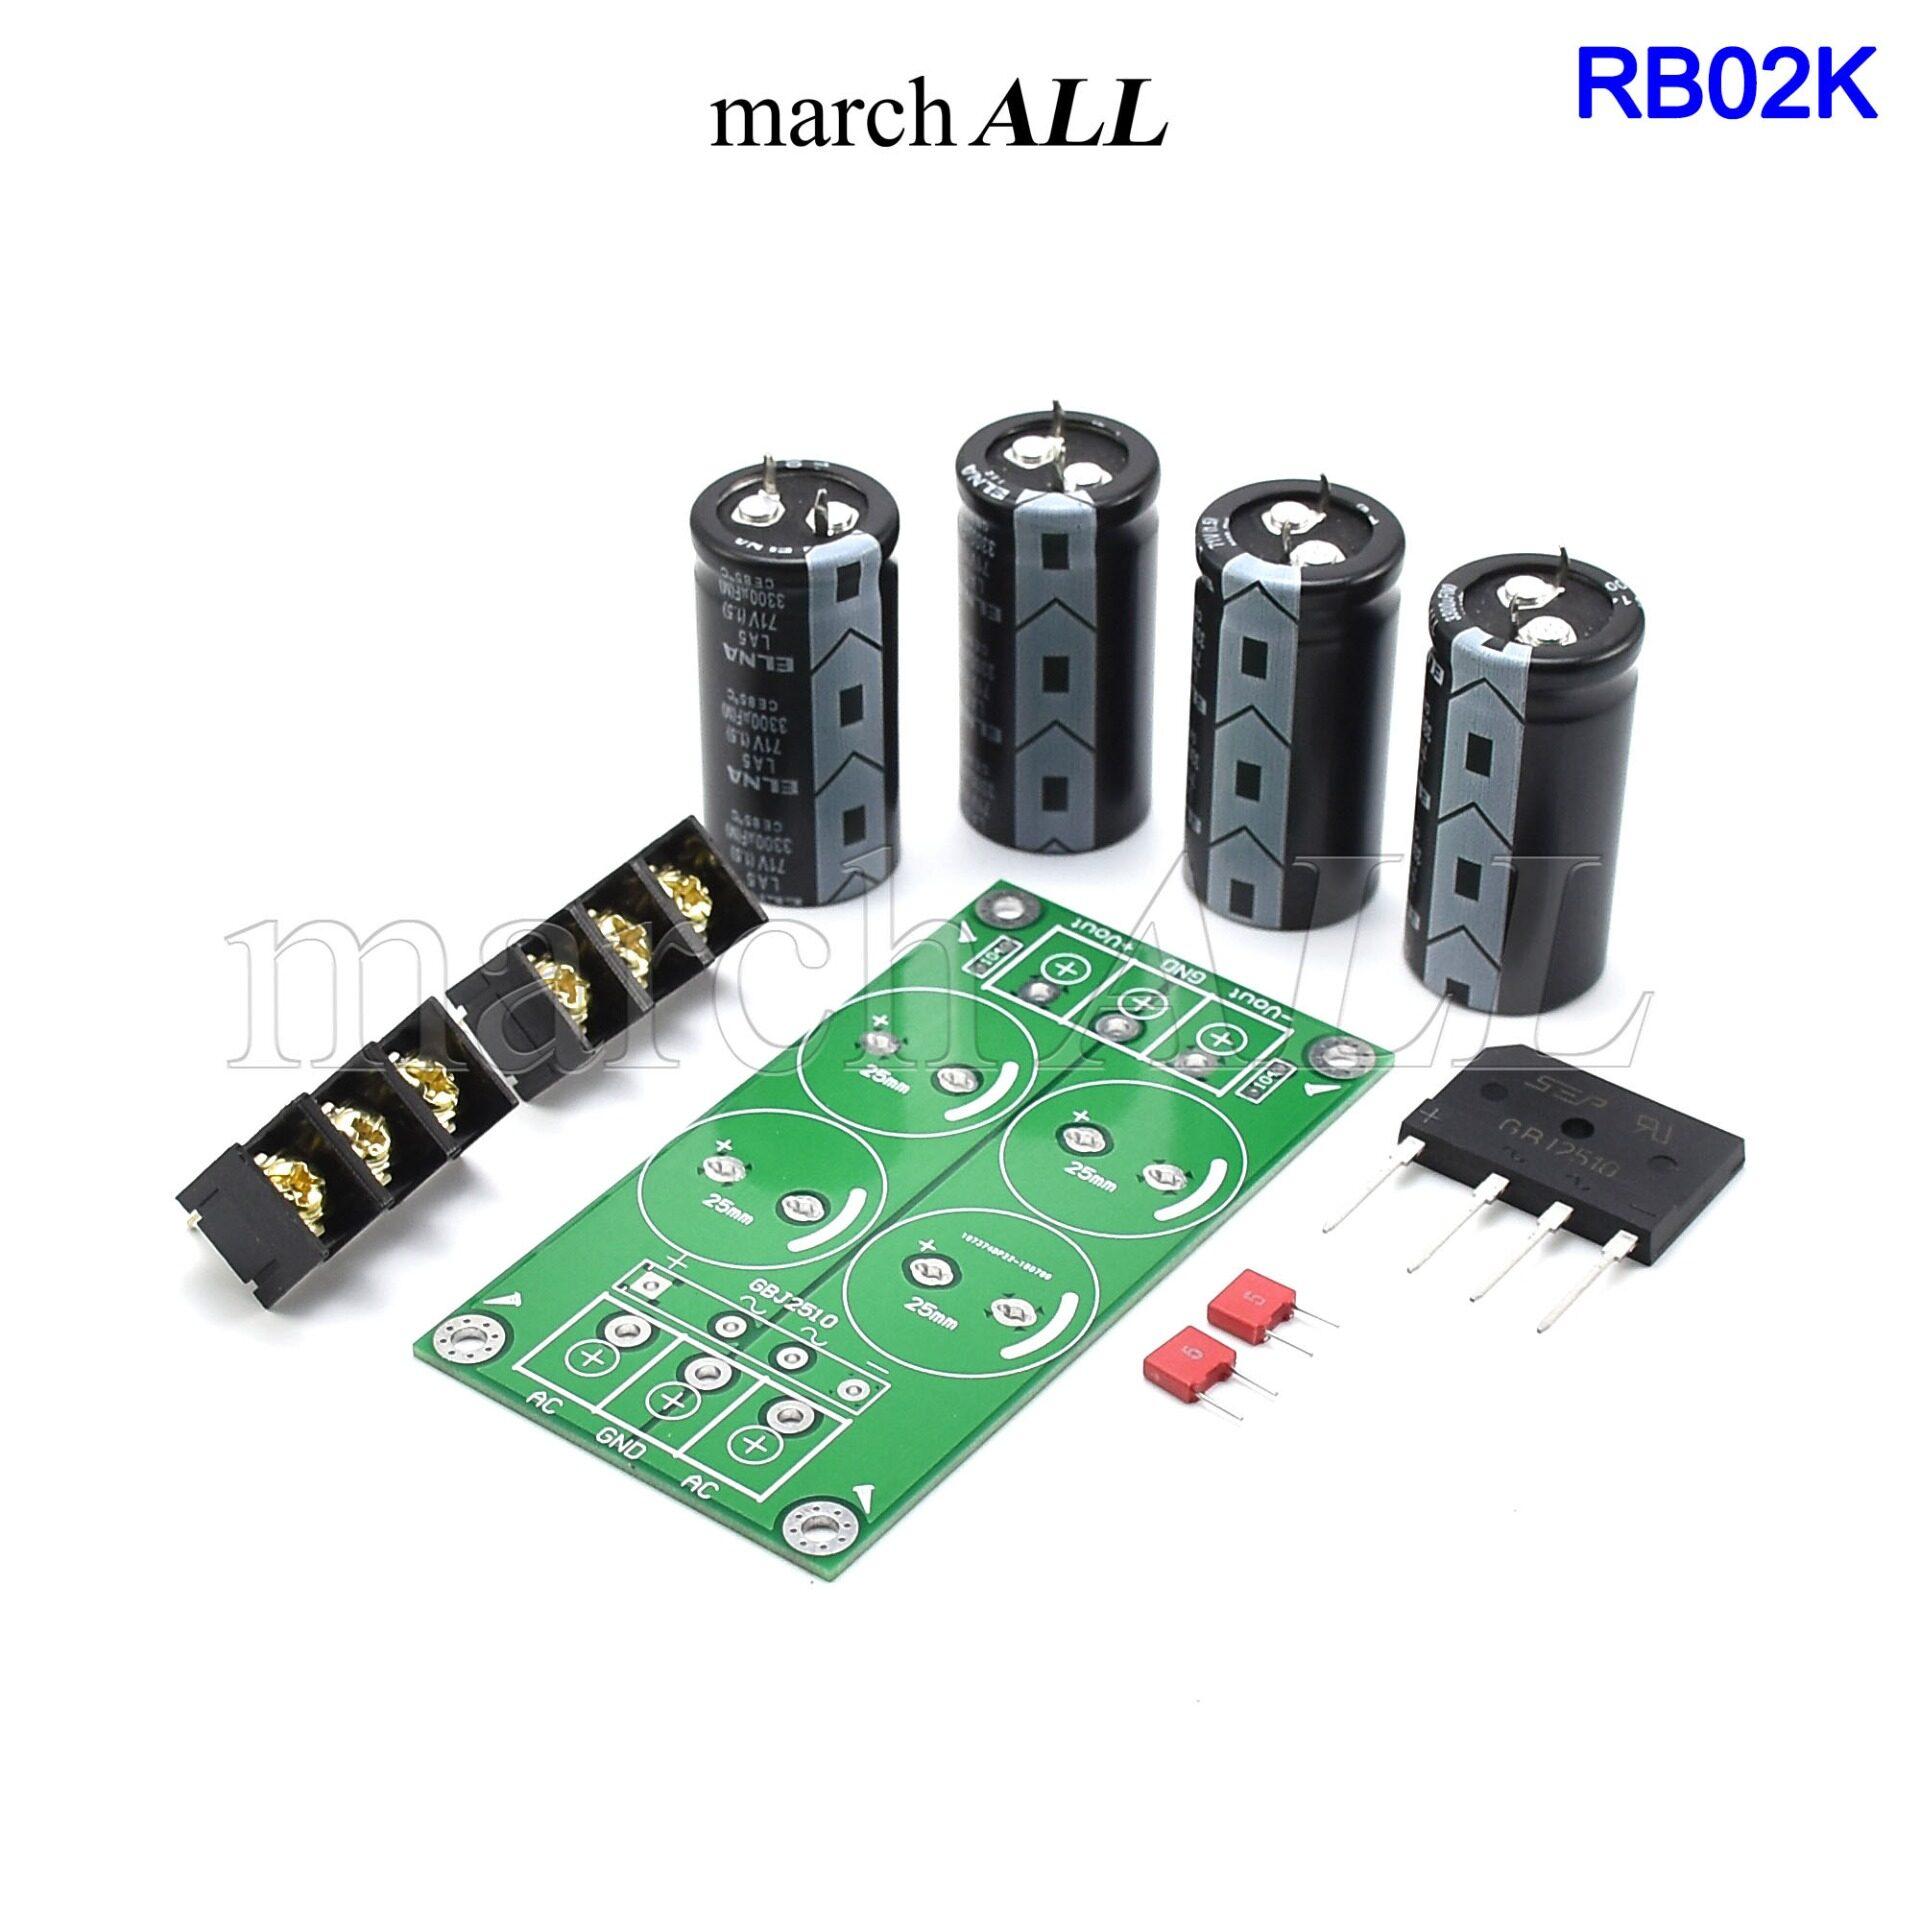 Marchall Rb02k ชุดคิท Kit บอร์ดจ่ายไฟ Dual Dc +- Ground บวก ลบ กราวด์ เพาเวอร์ซัพพลาย ดูออล ดีซี เร็กติไฟเออร์ เรียงกระแส กรอง C-Filter เป็นไฟ Dc Supply จากหม้อแปลง ใช้กับ บอร์ดไดร์741 แอมป์ ทุกวงจร อิเล็กฯ Amp ปรีแอมป์ กีต้าร์ Ac To Dc Rectifier Board.